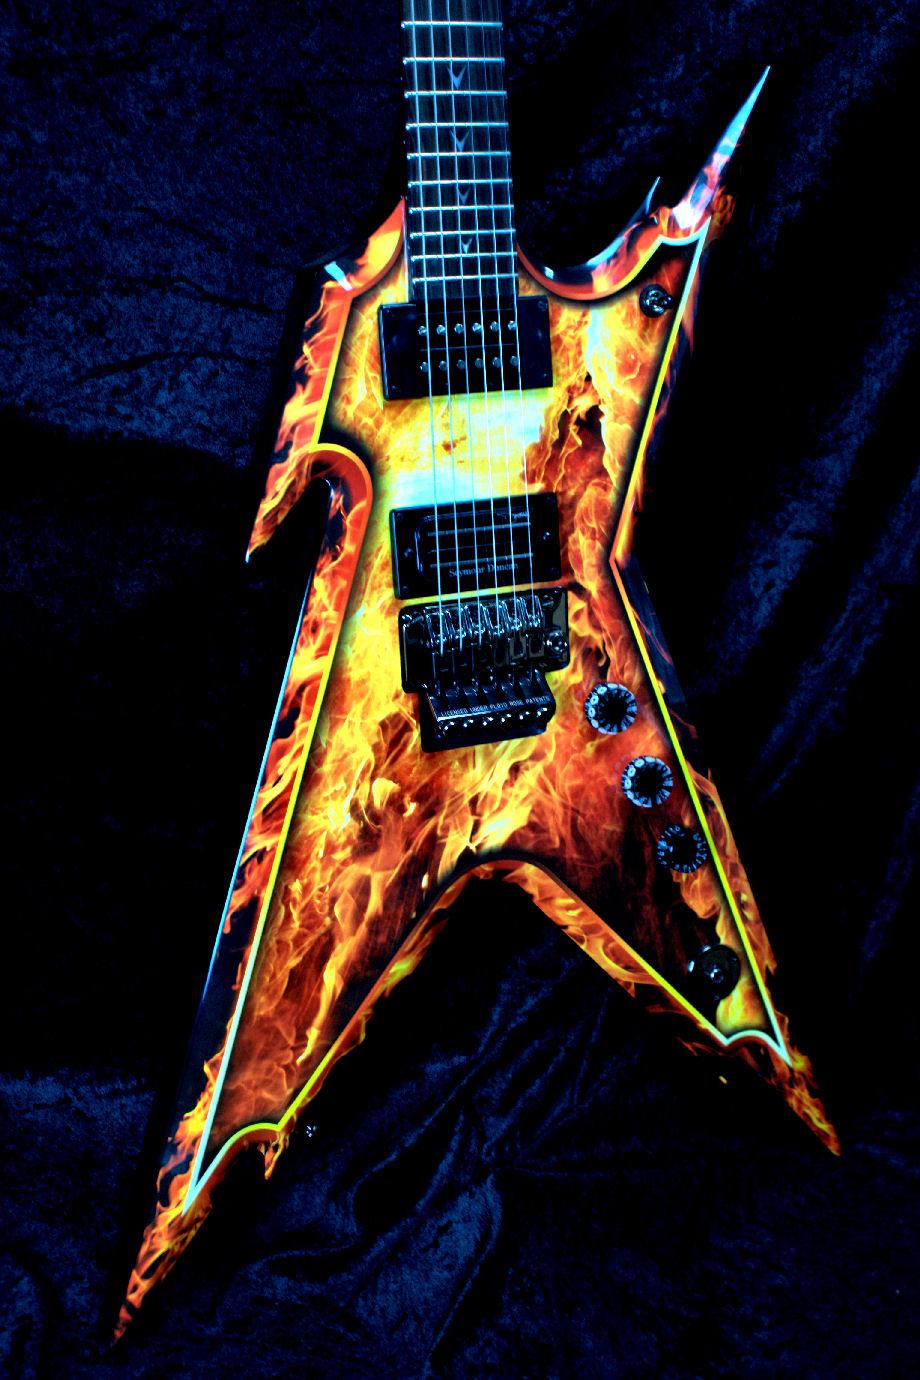 gibson guitarras wallpapers